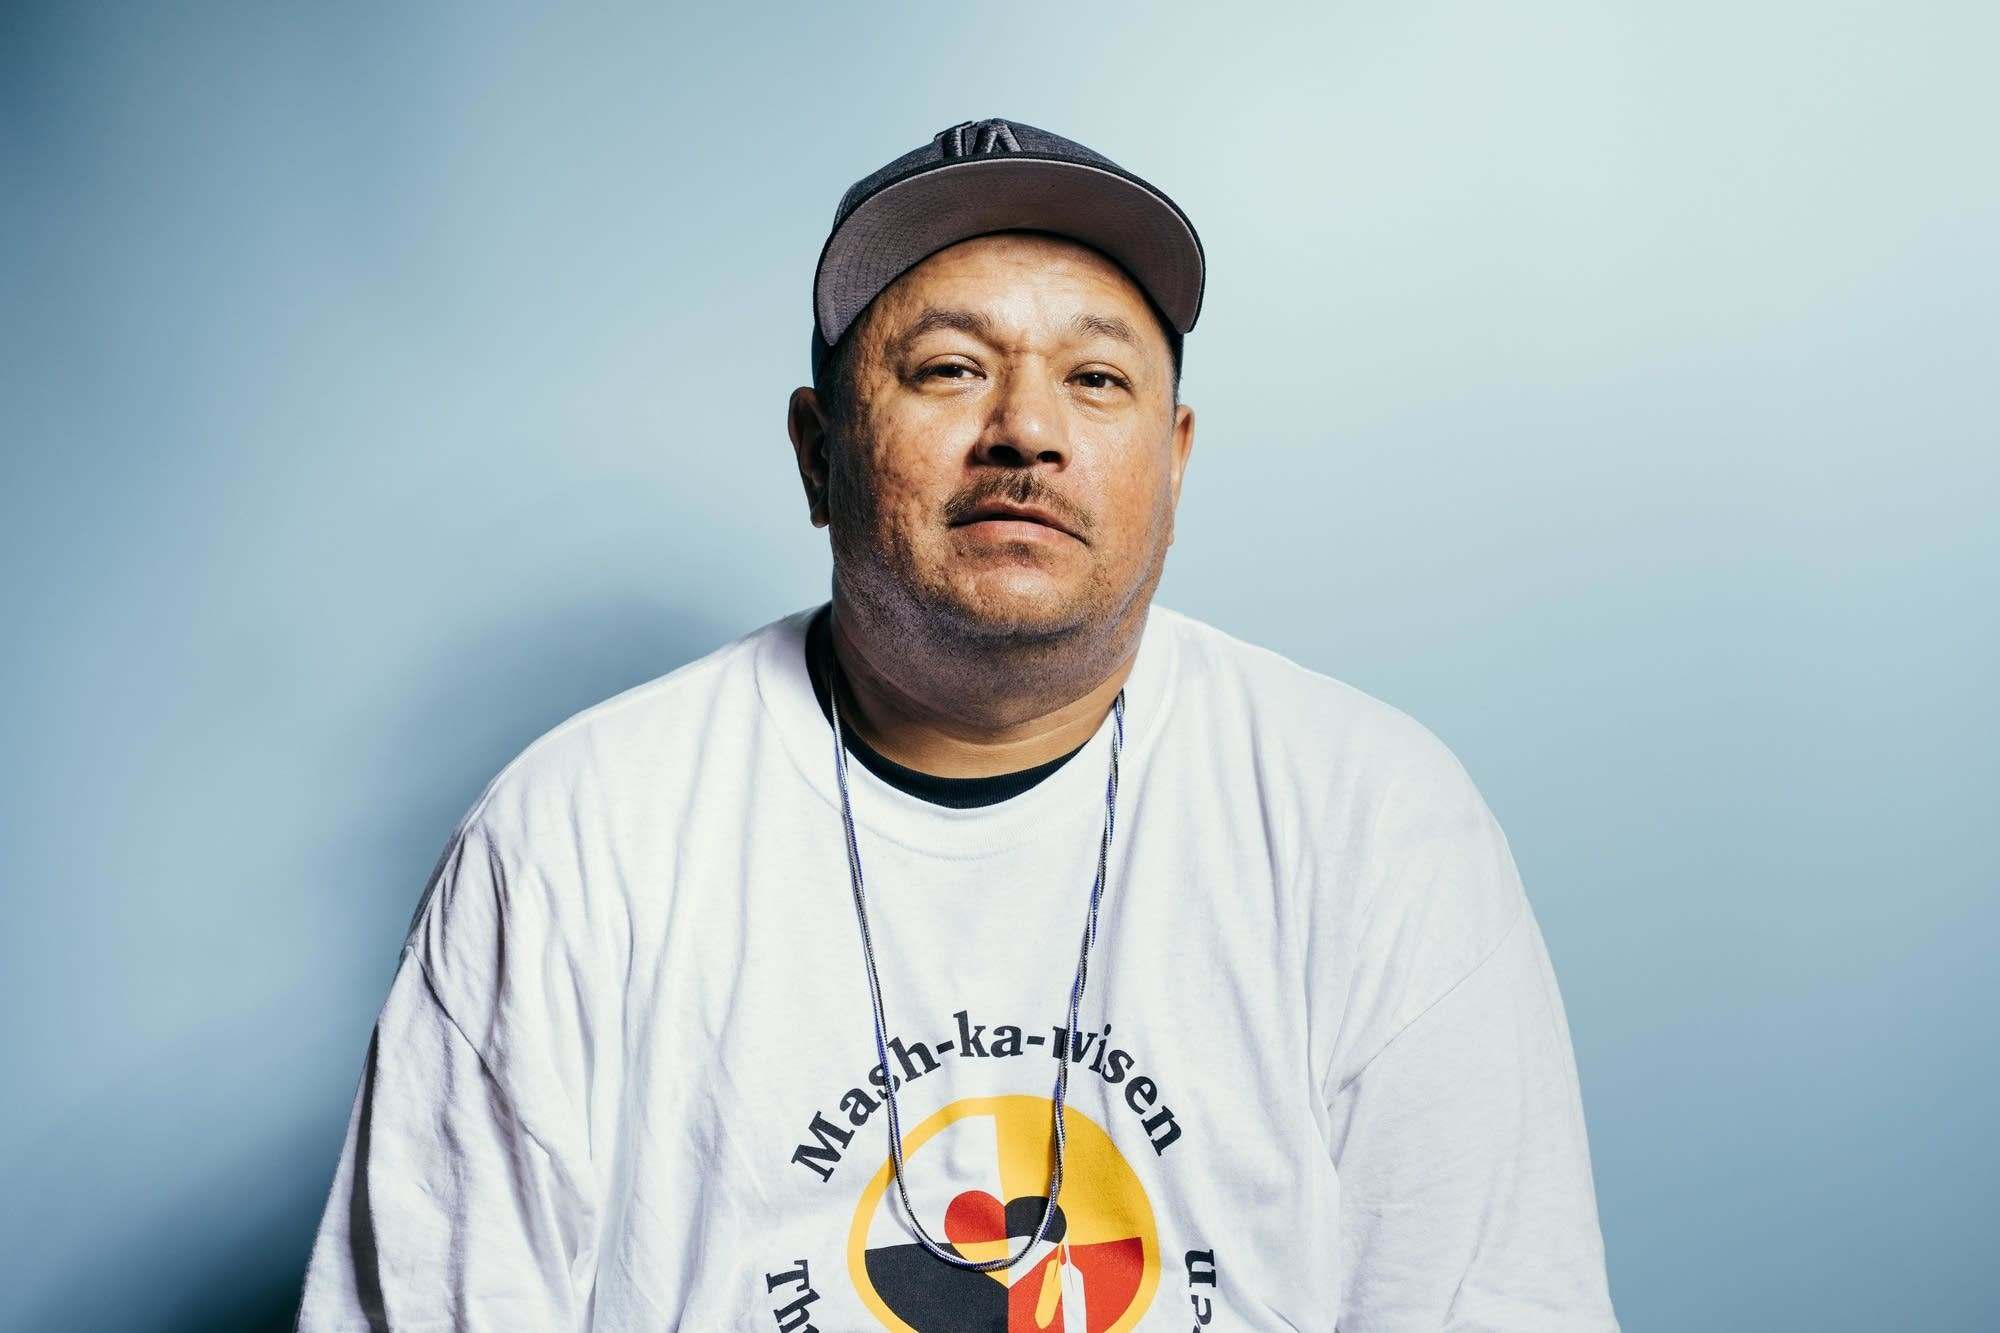 James Fisher of the Leech Lake Band of Ojibwe